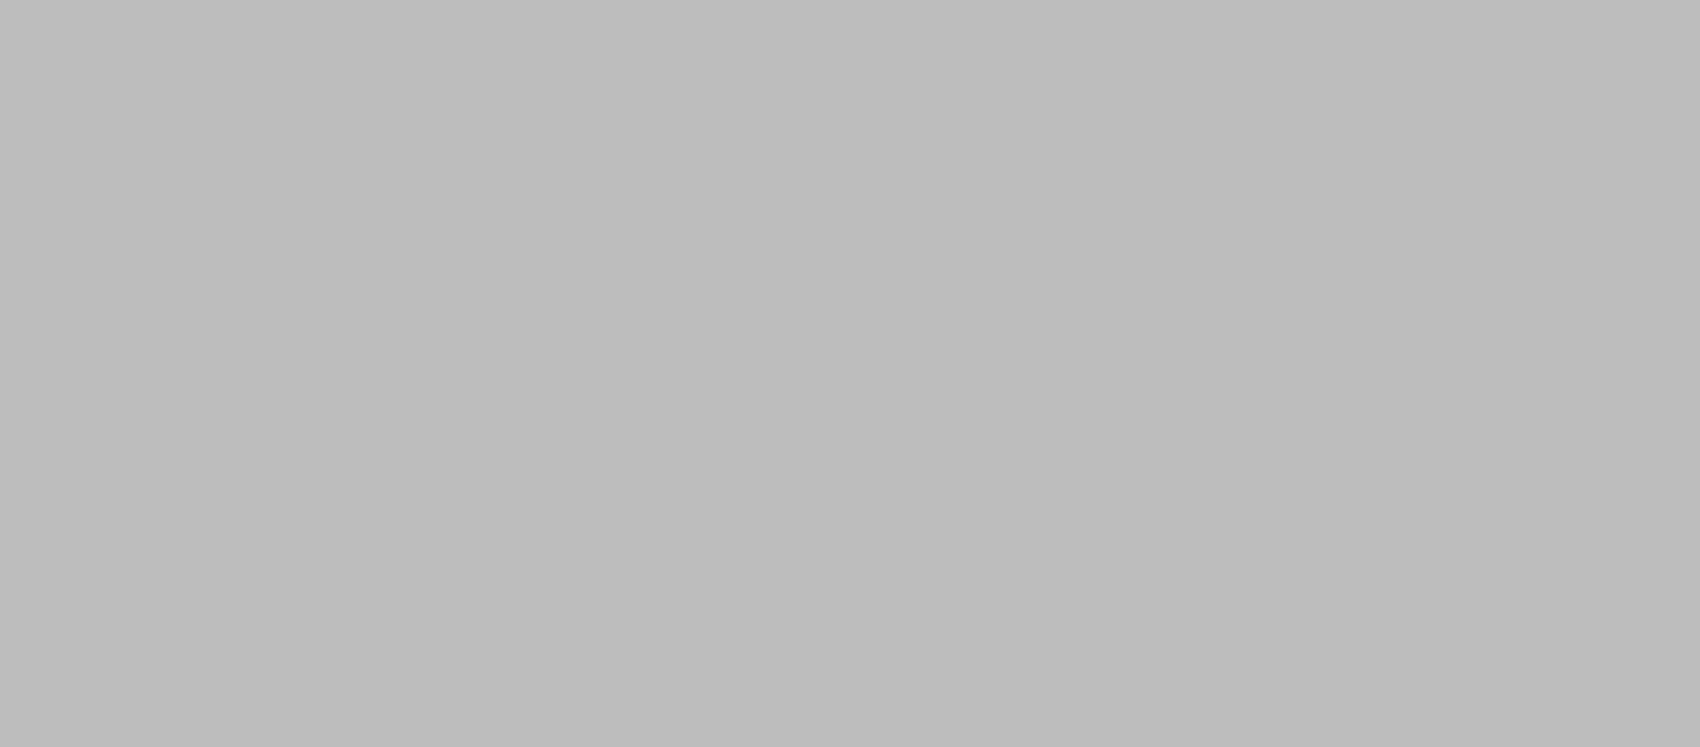 Middle Banner color#bdbdbd.jpg